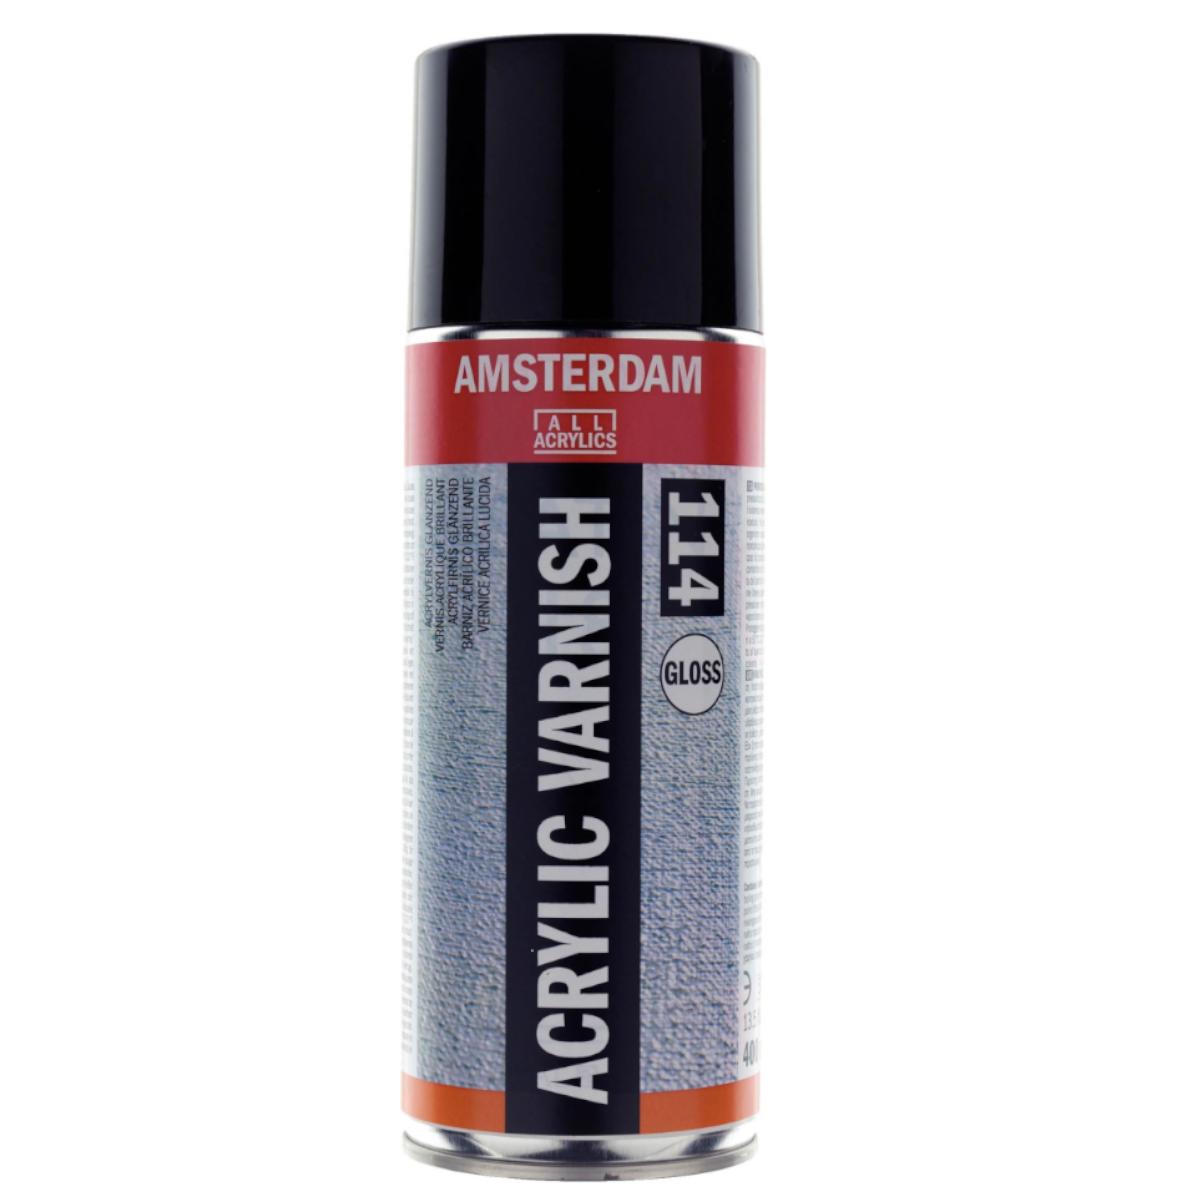 Amsterdam, Acrylic Varnish, 114, gloss, 400 ml.